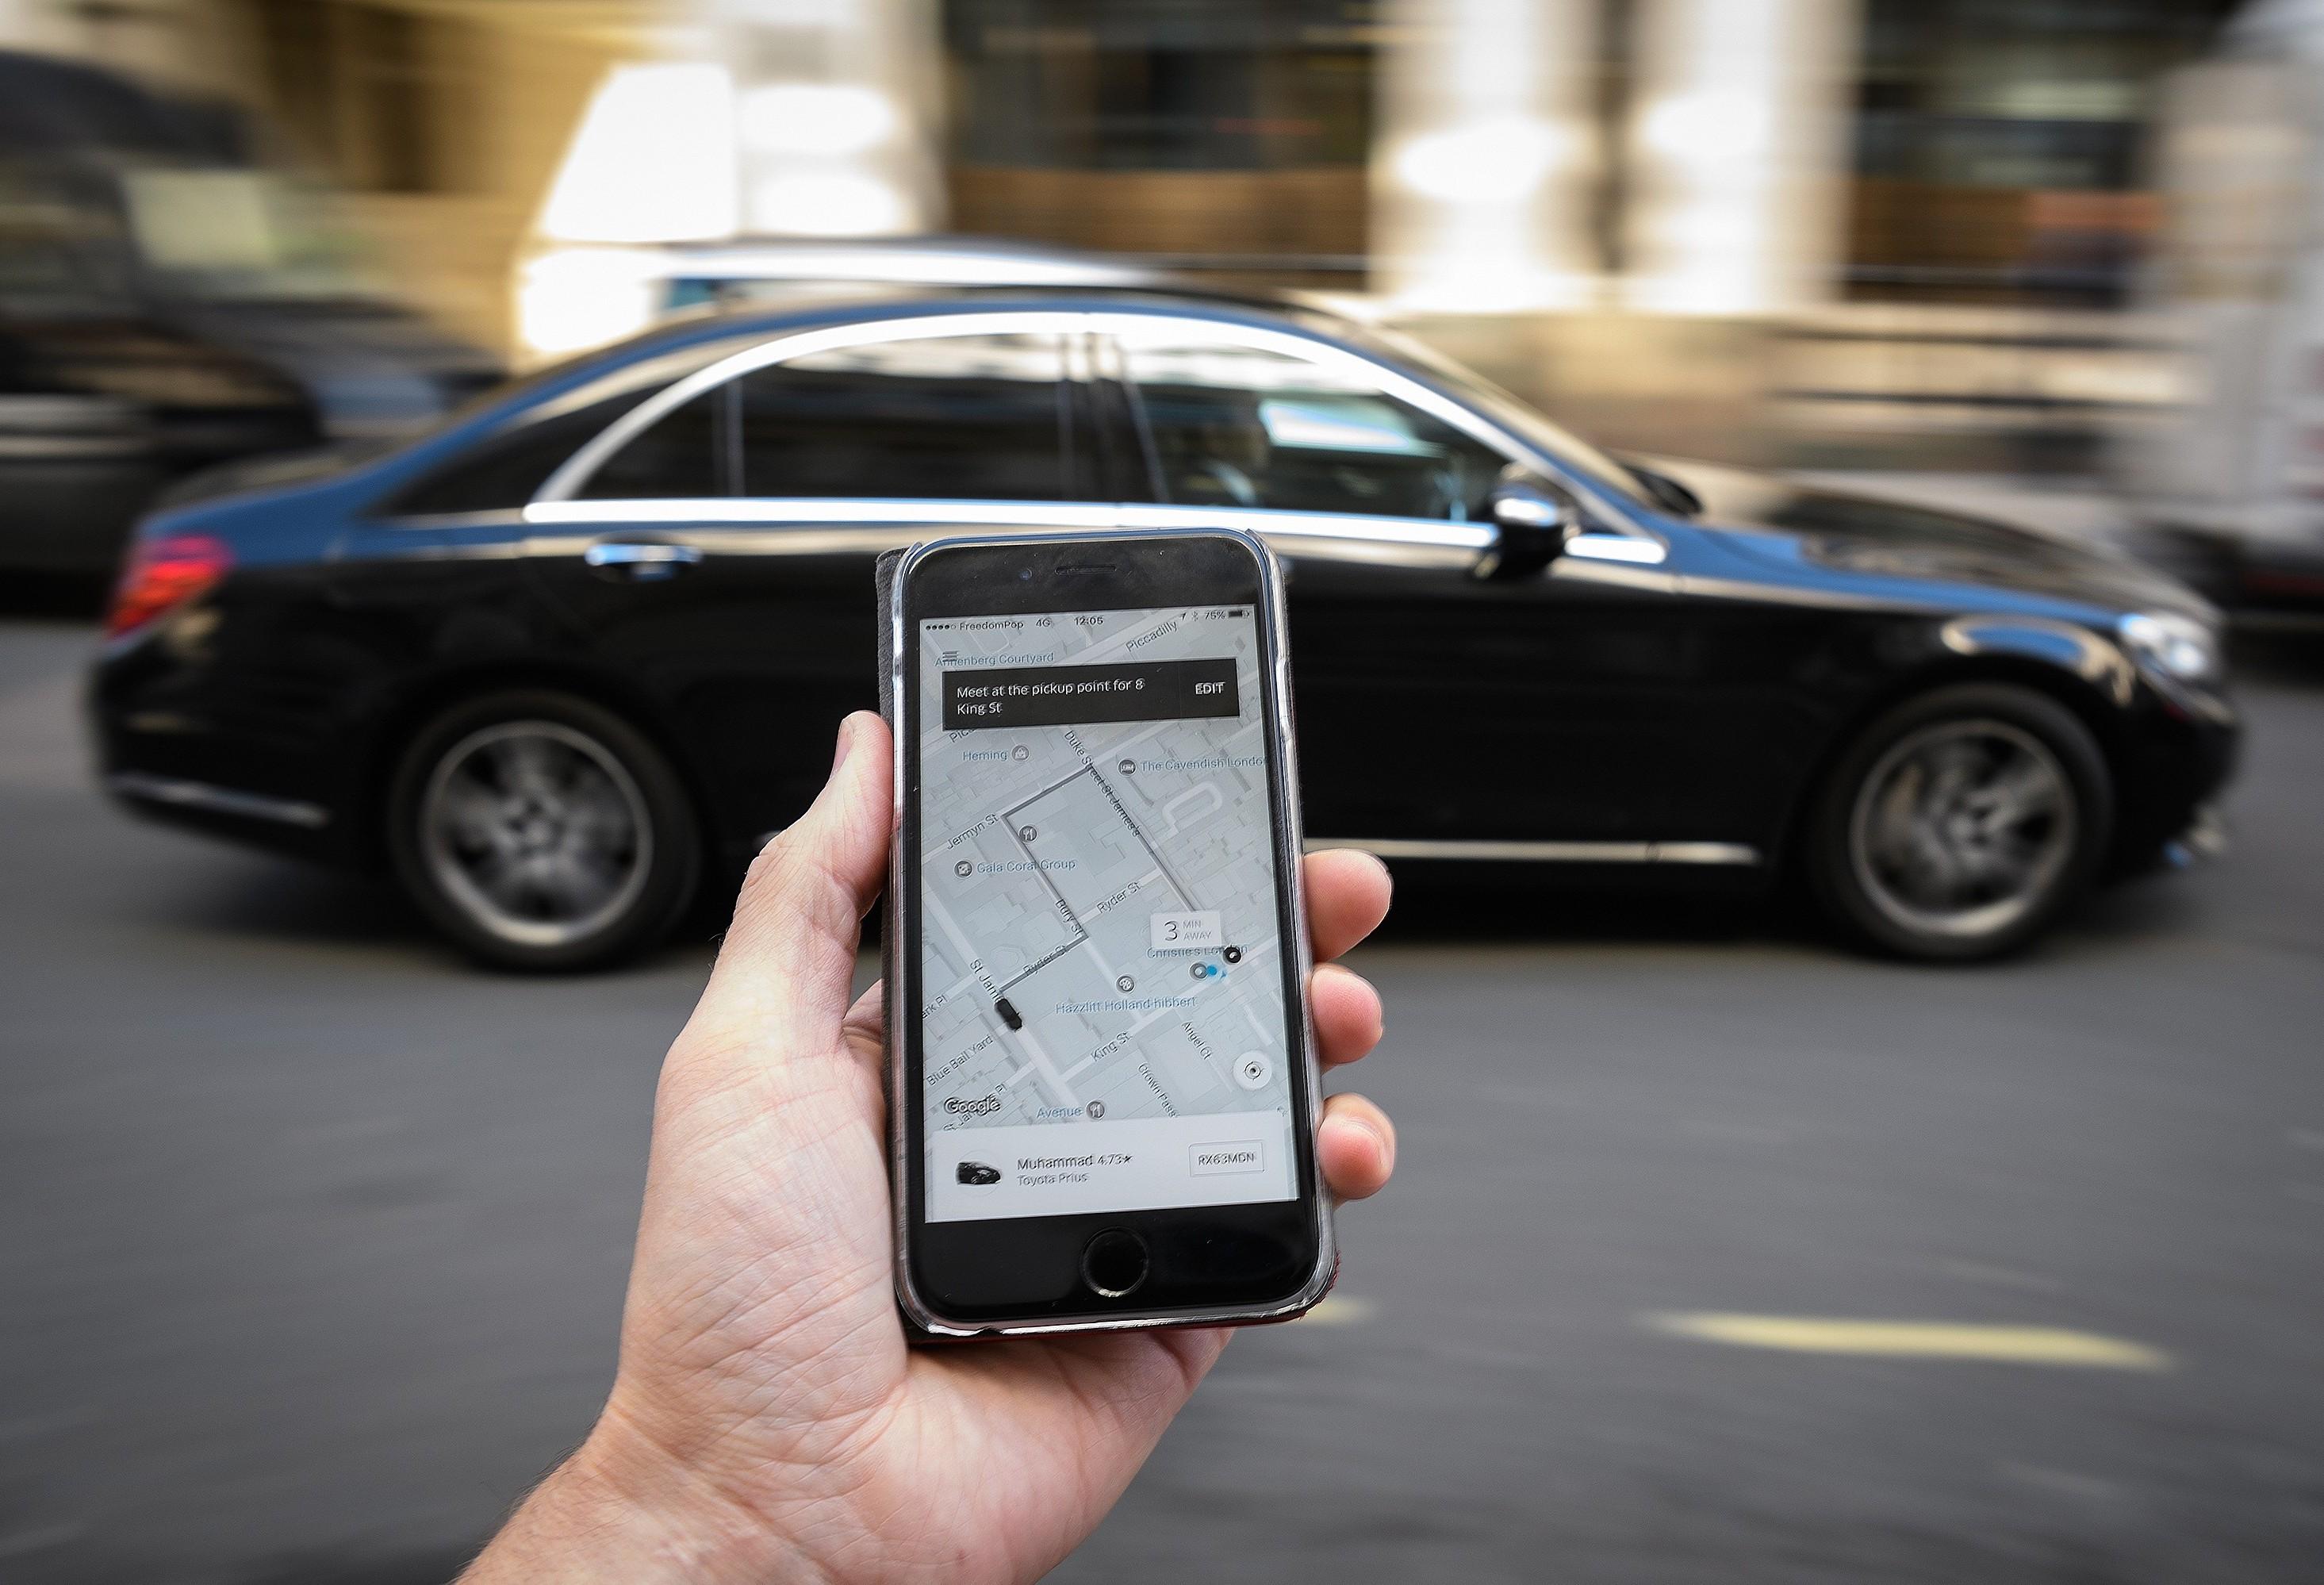 Projeto de Lei que regulamenta motoristas de aplicativos é aprovado